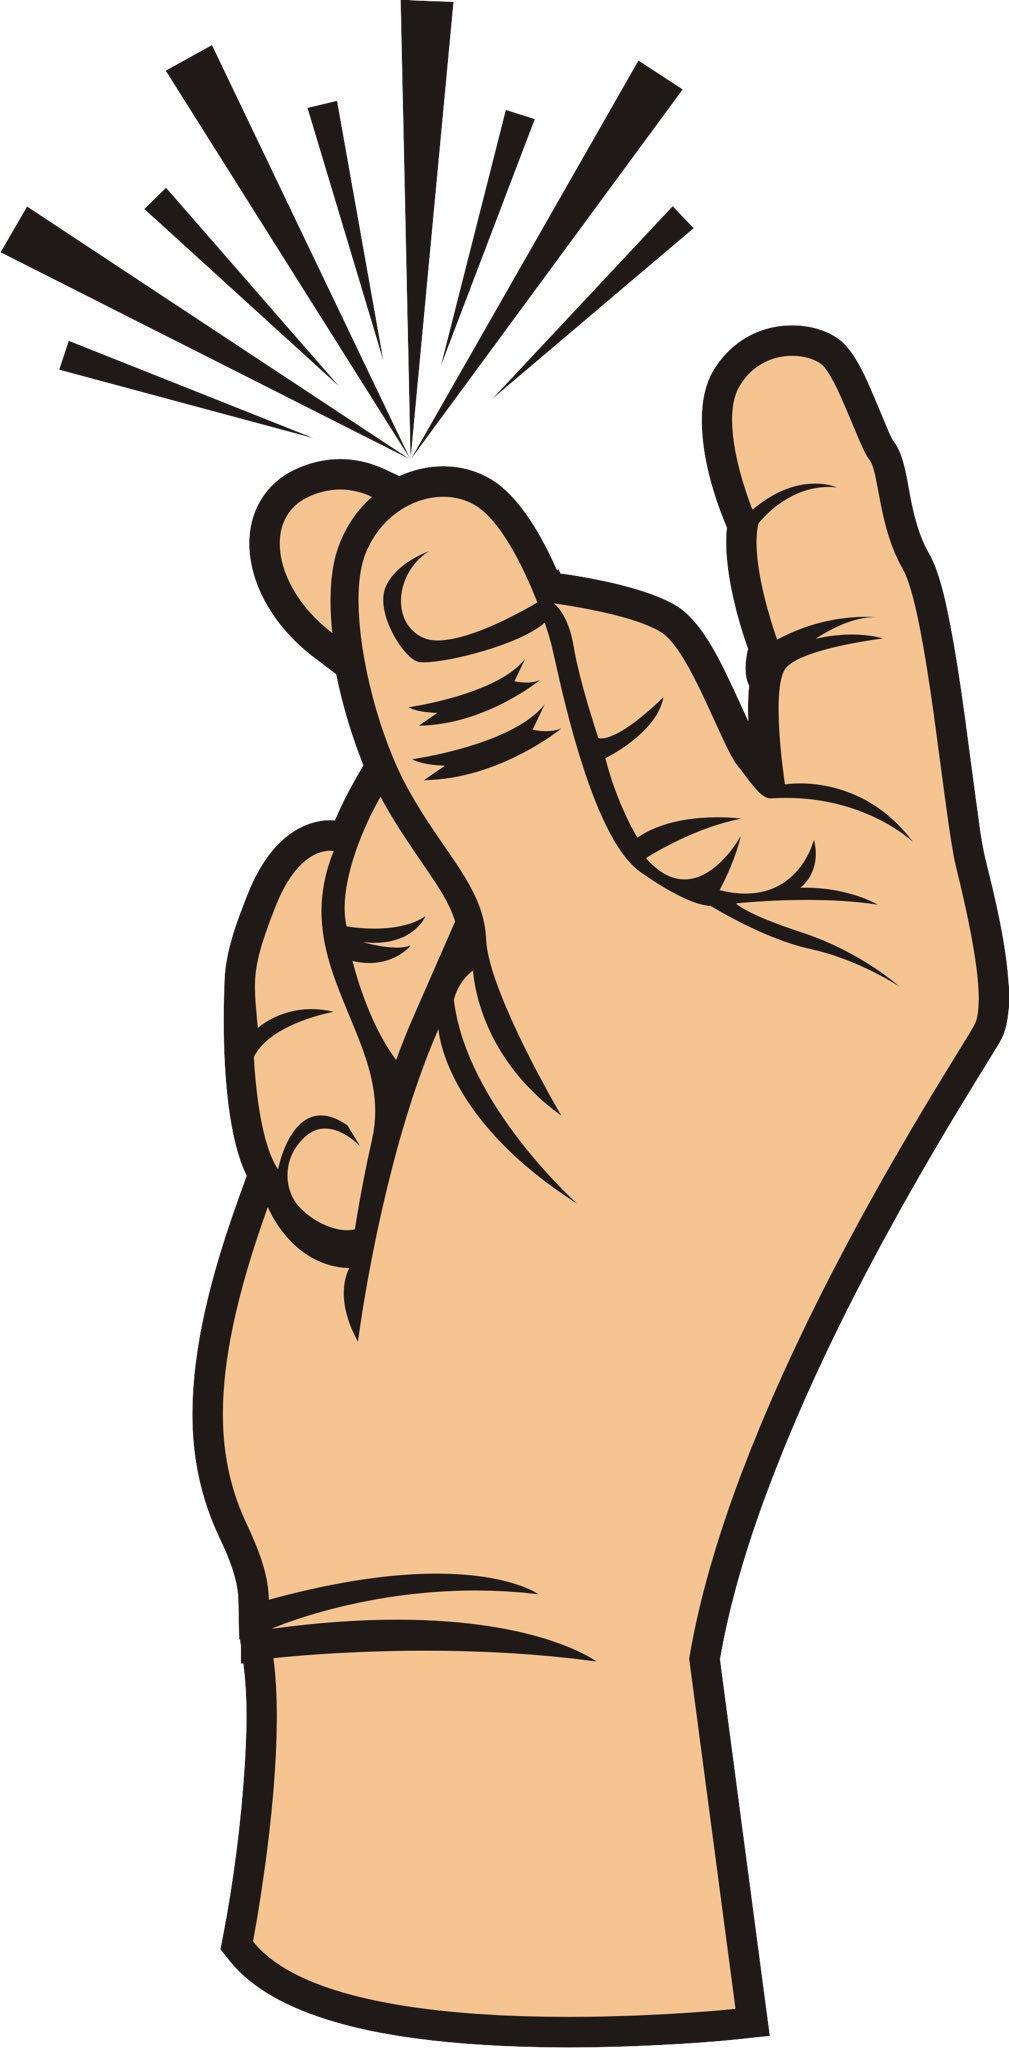 Finger clipart snap, Finger snap Transparent FREE for.